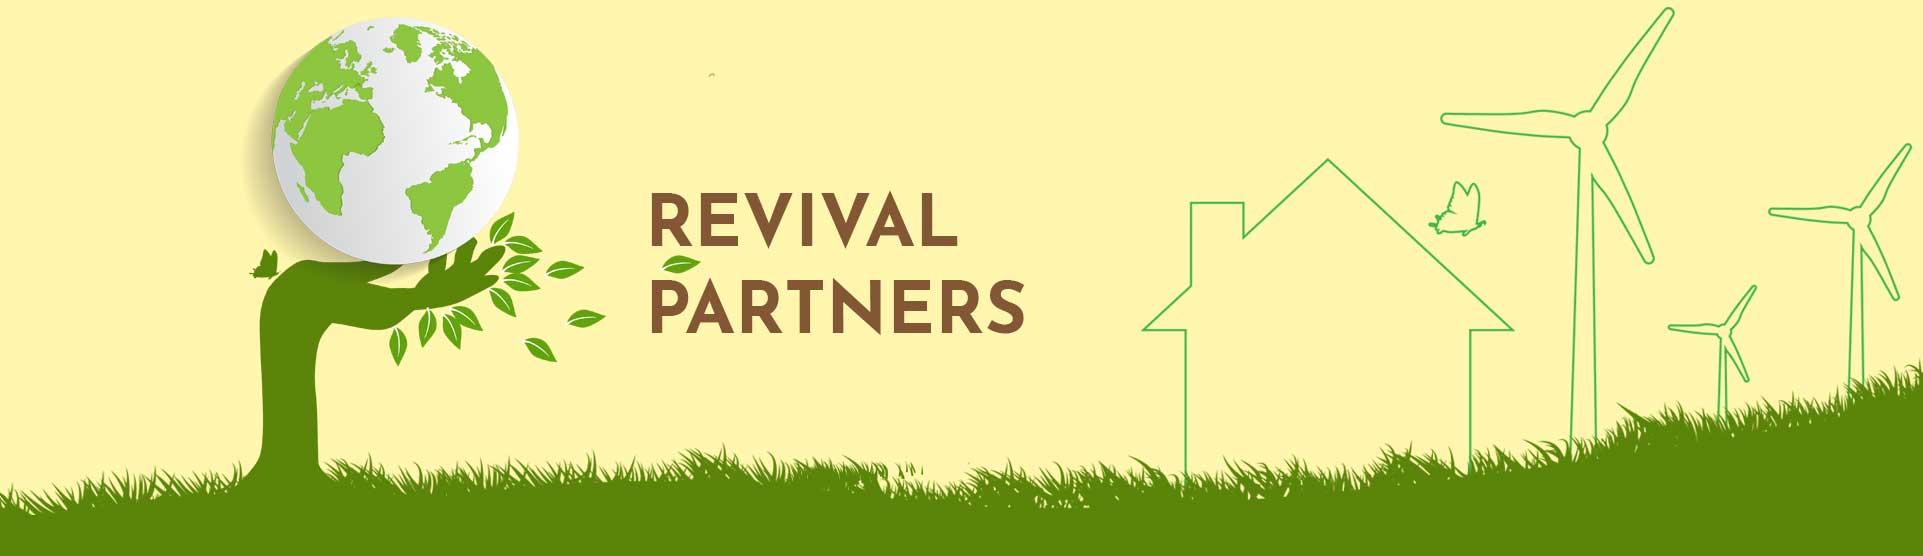 Revival Partners